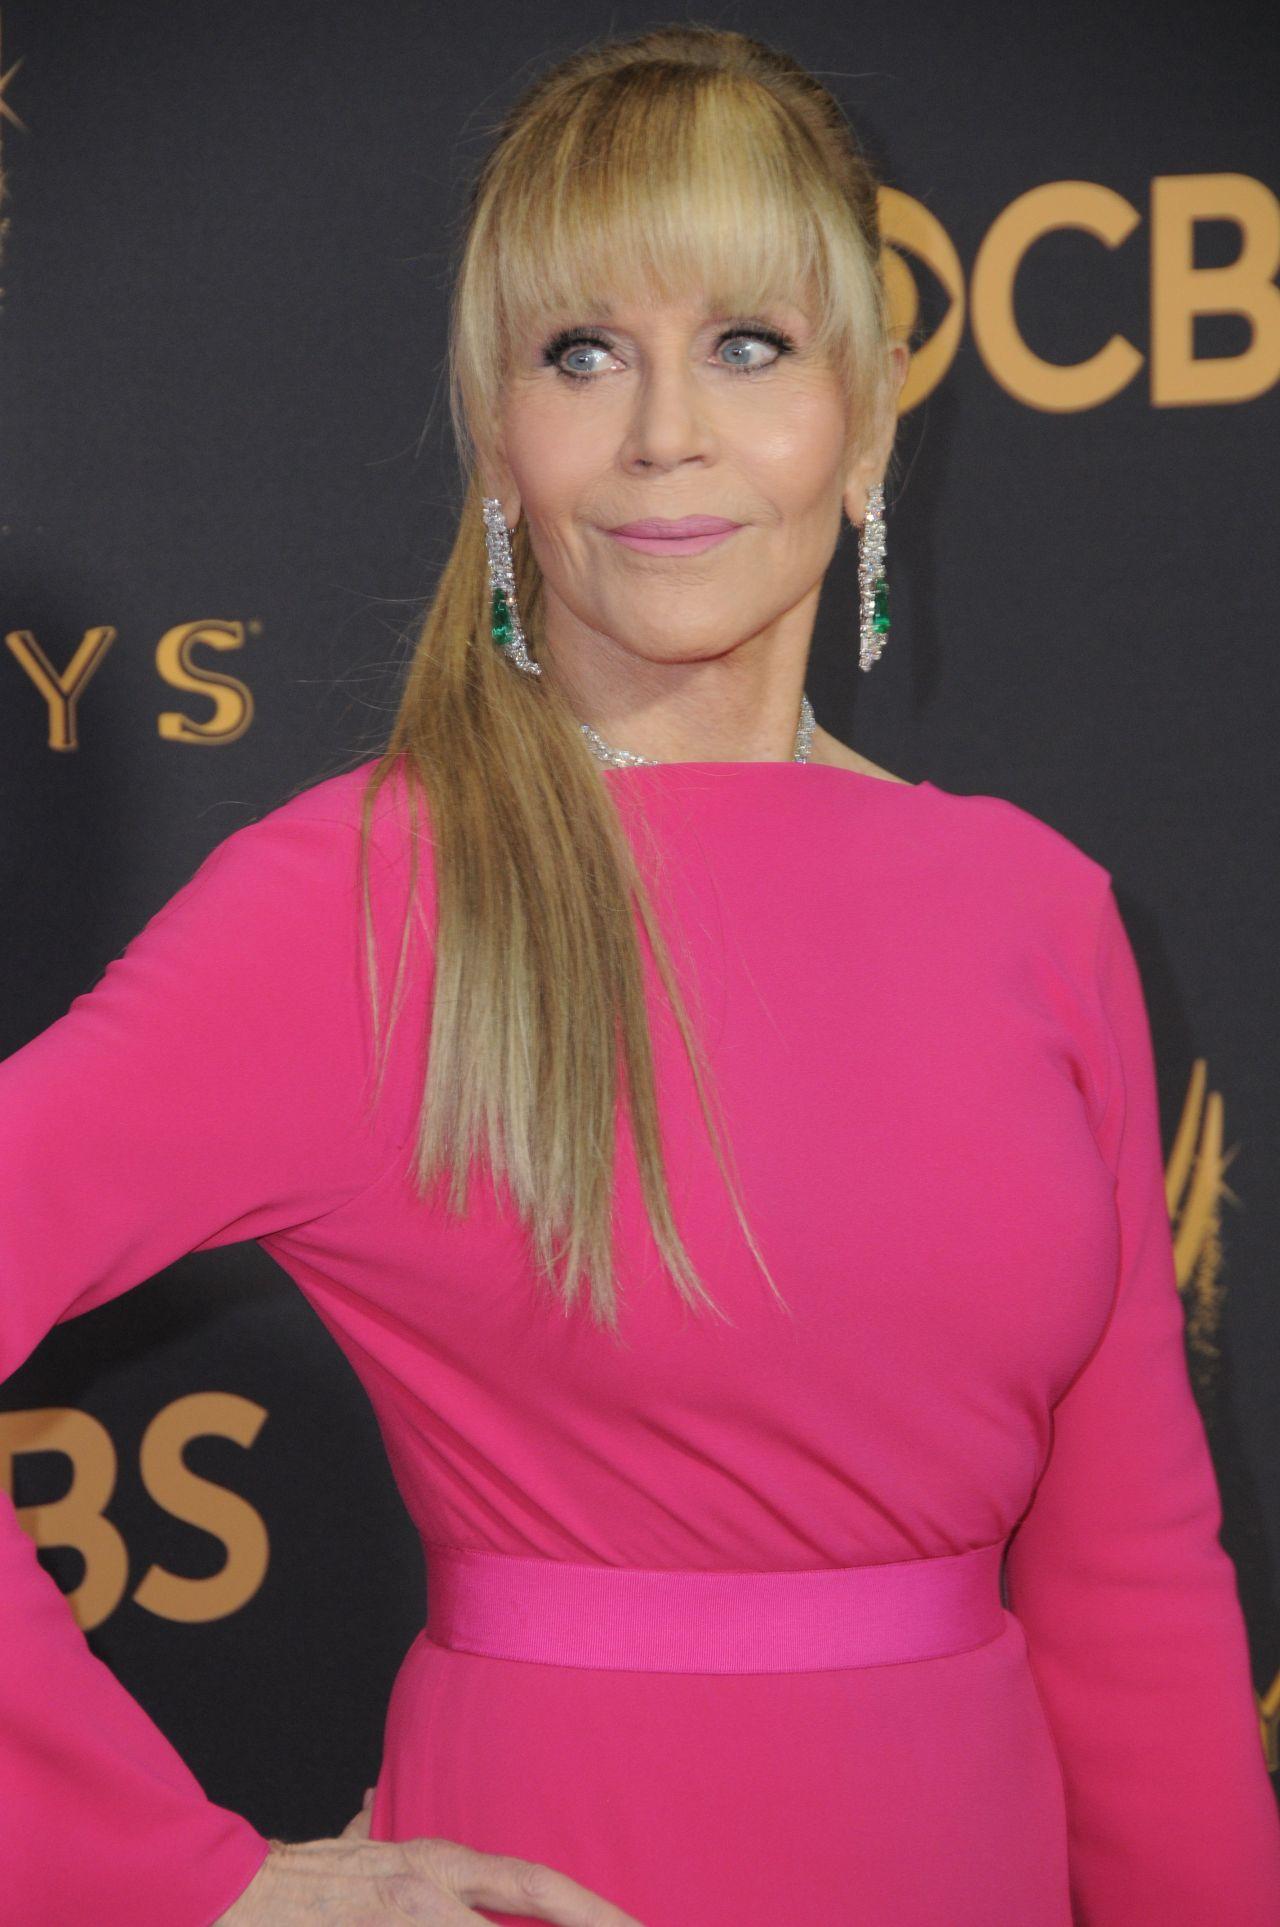 Jane Fonda Emmy Awards In Los Angeles 09 17 2017